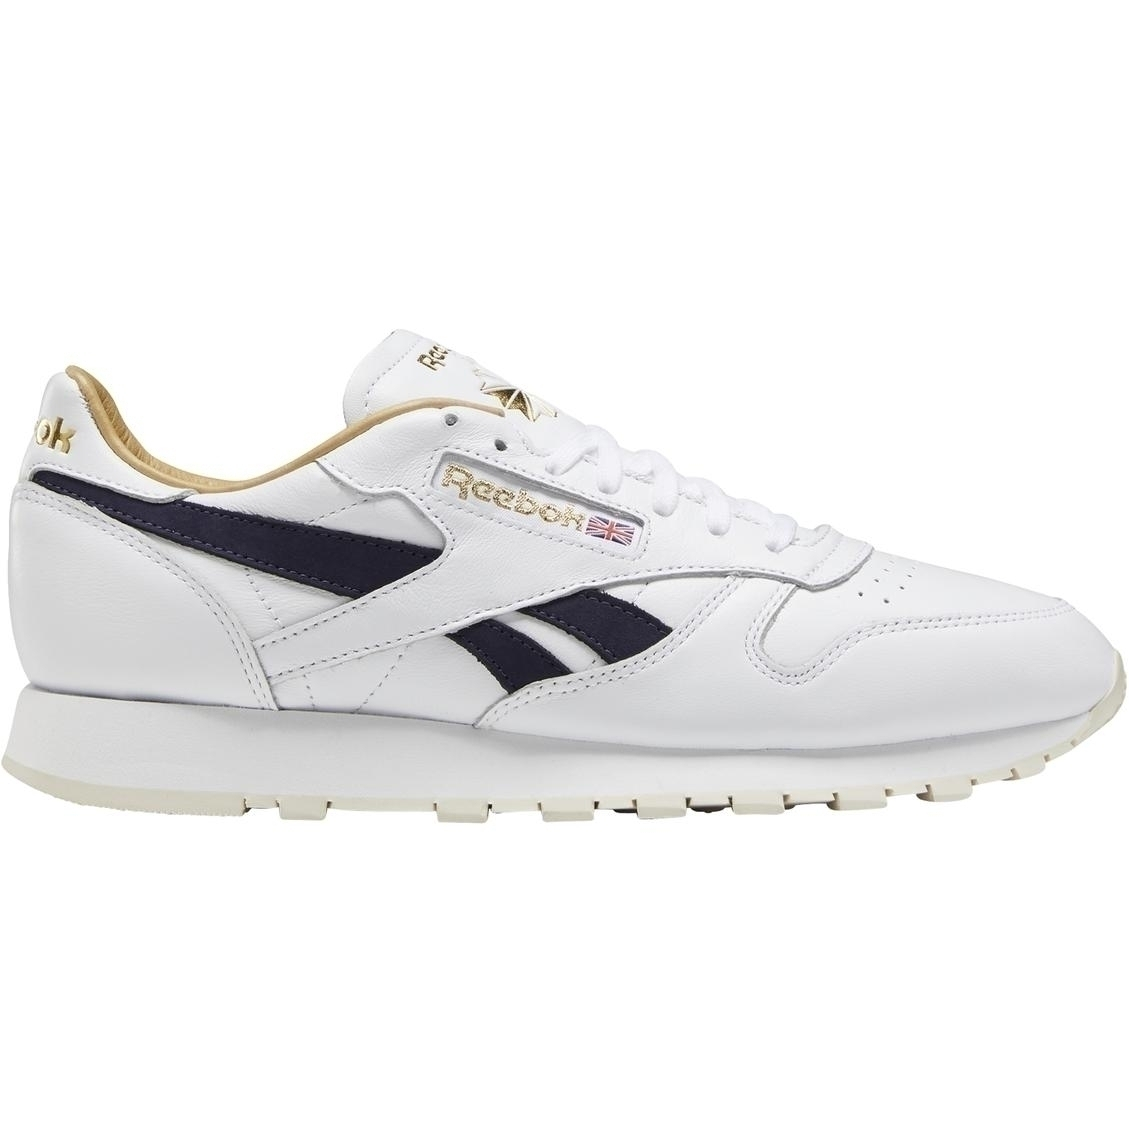 Reebok Classic Leather MU Sneaker